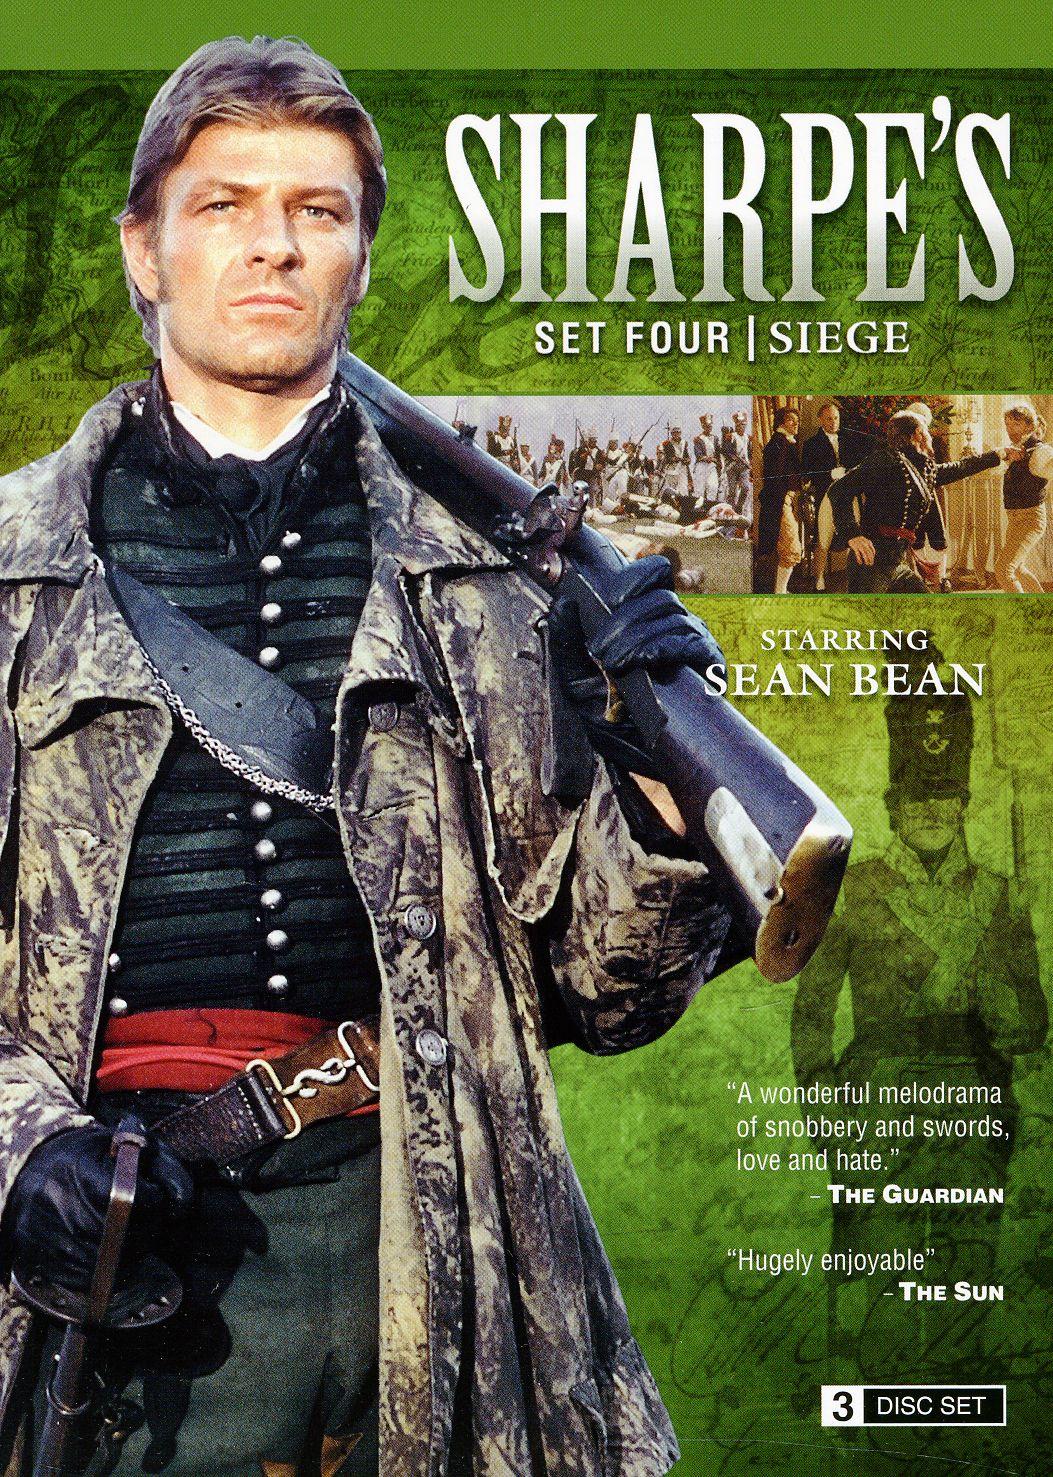 Sharpe Set Four: Seige (DVD)